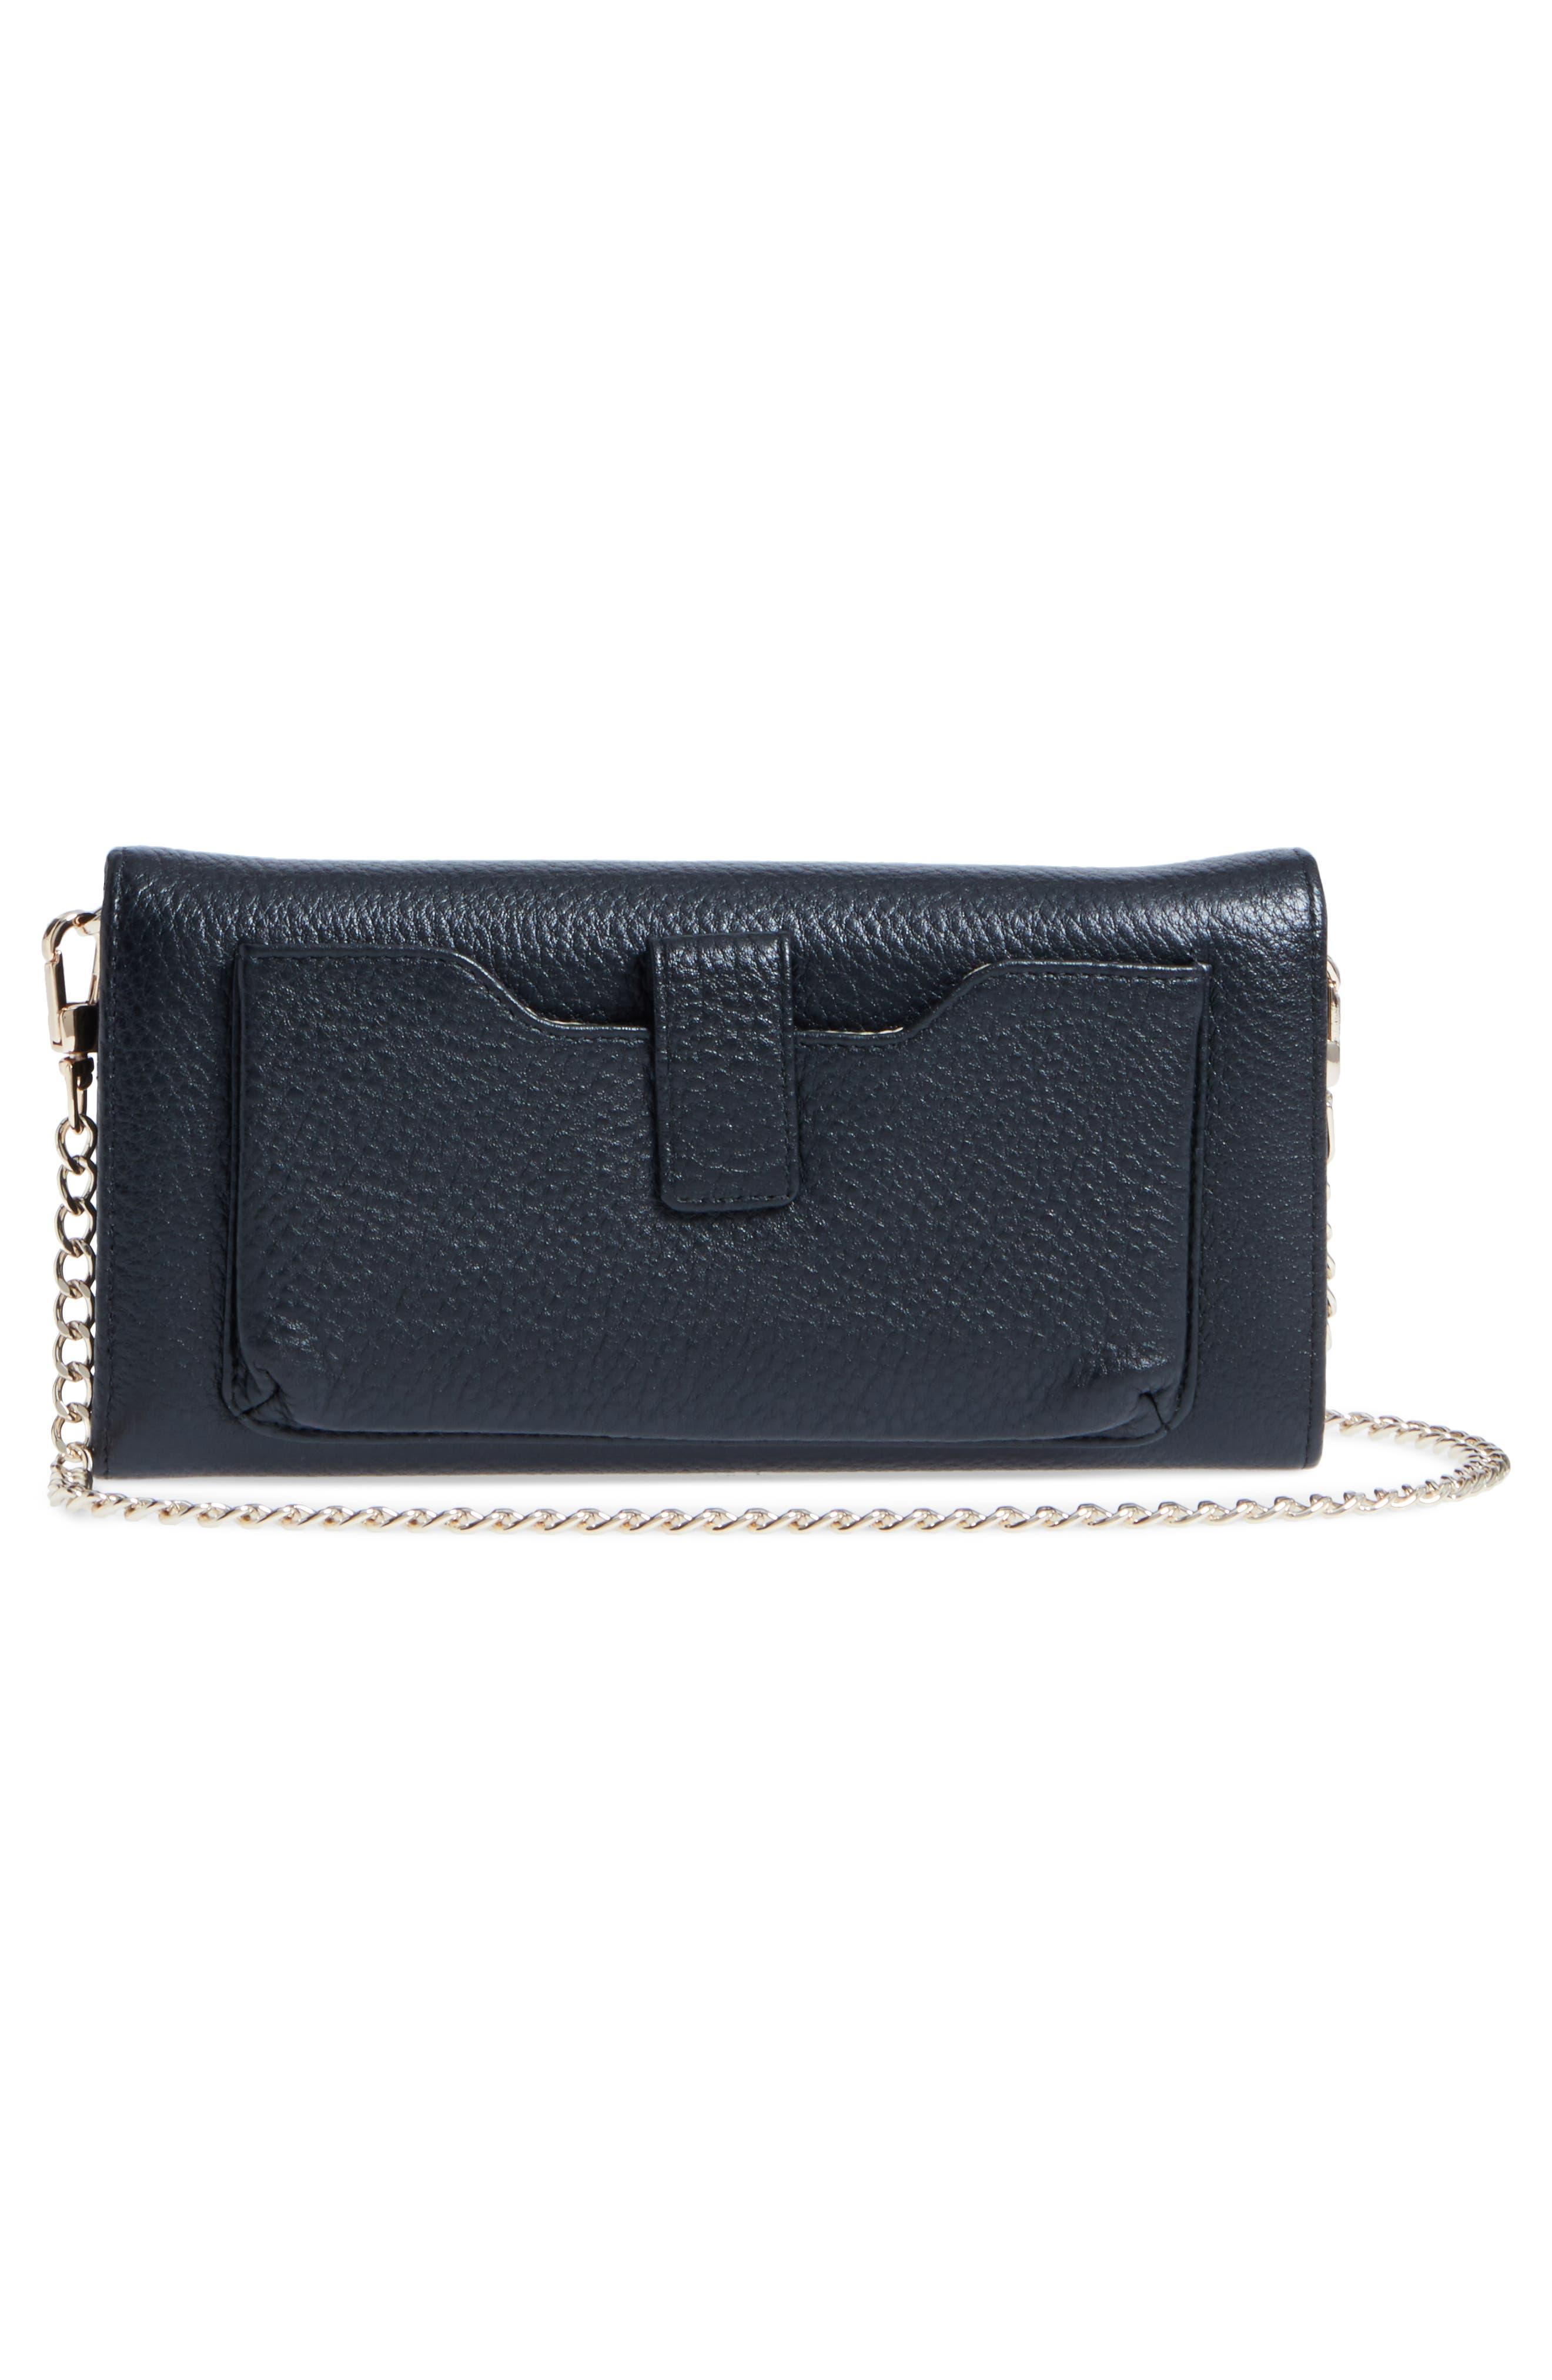 Céline Dion Adagio Leather Crossbody Wallet,                             Alternate thumbnail 4, color,                             001